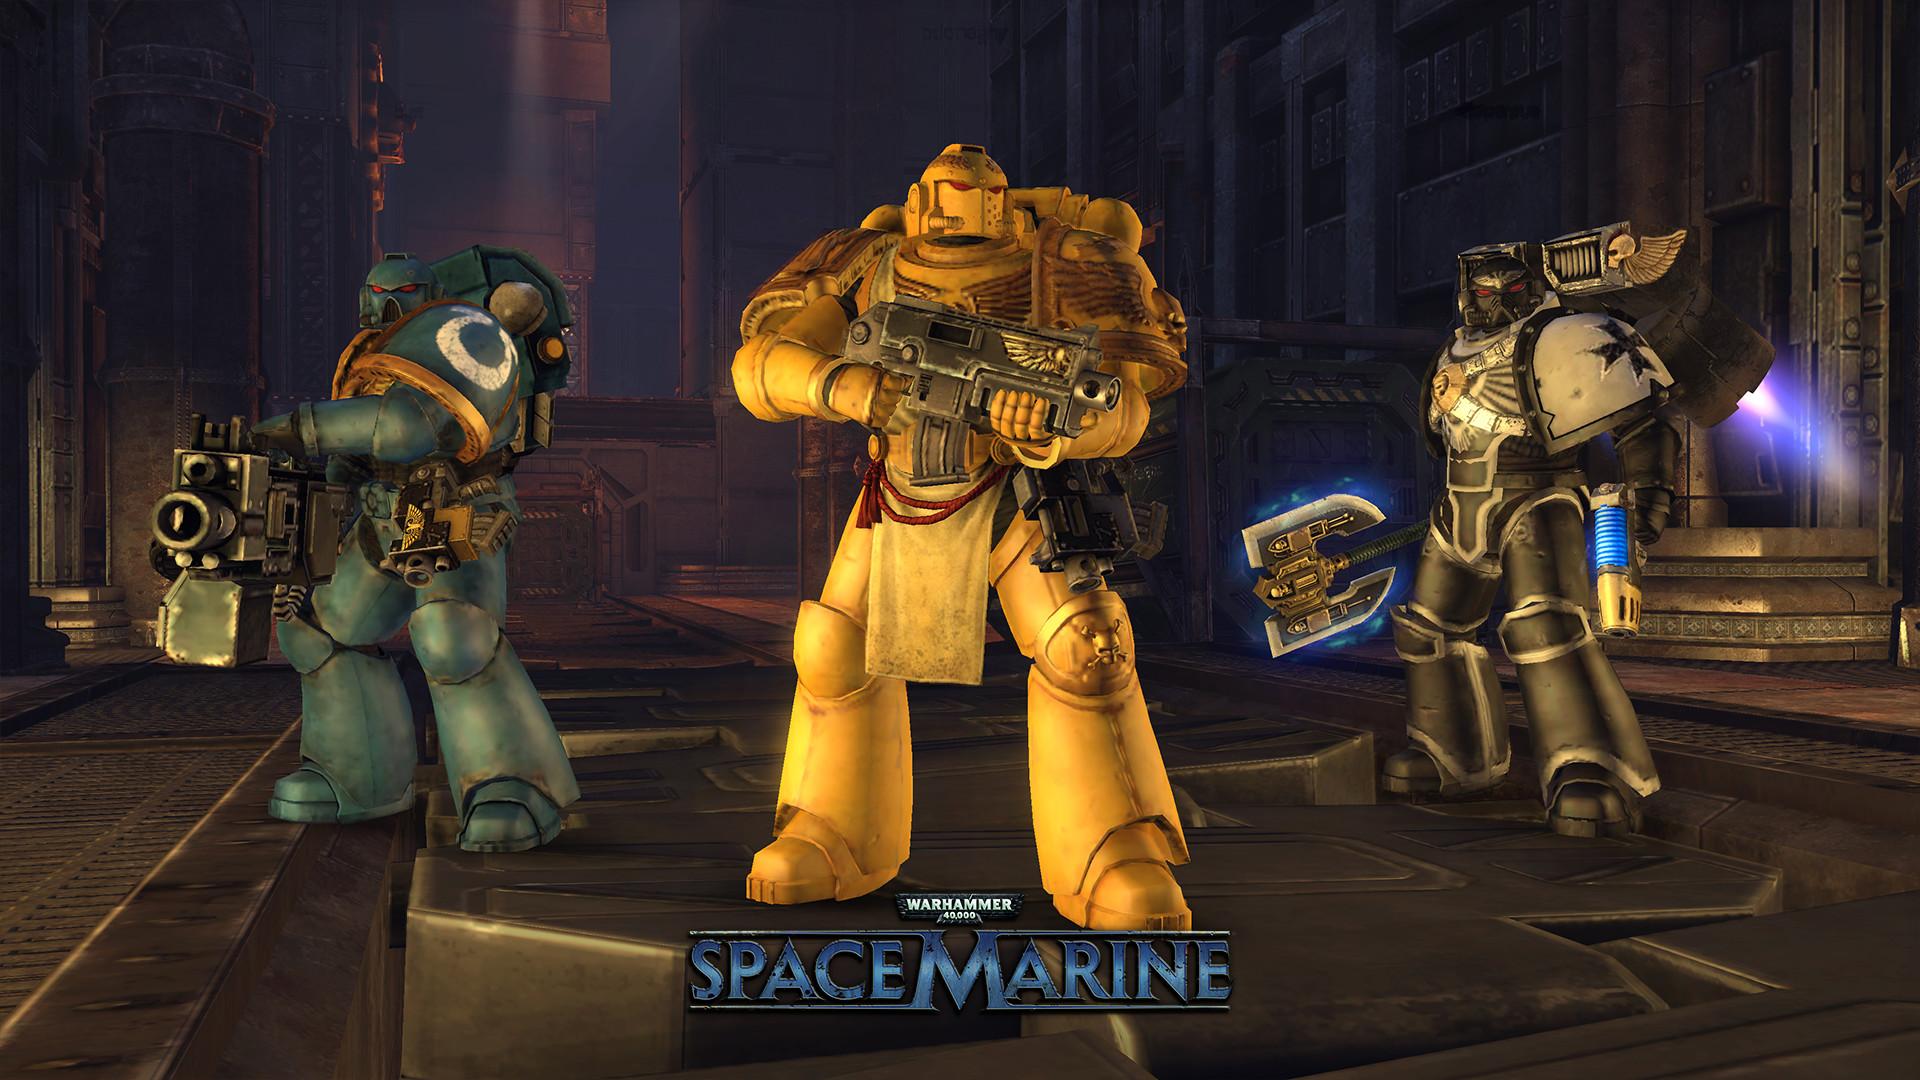 Warhammer 40k Space Marines: Download Warhammer 40,000: Space Marine Full PC Game